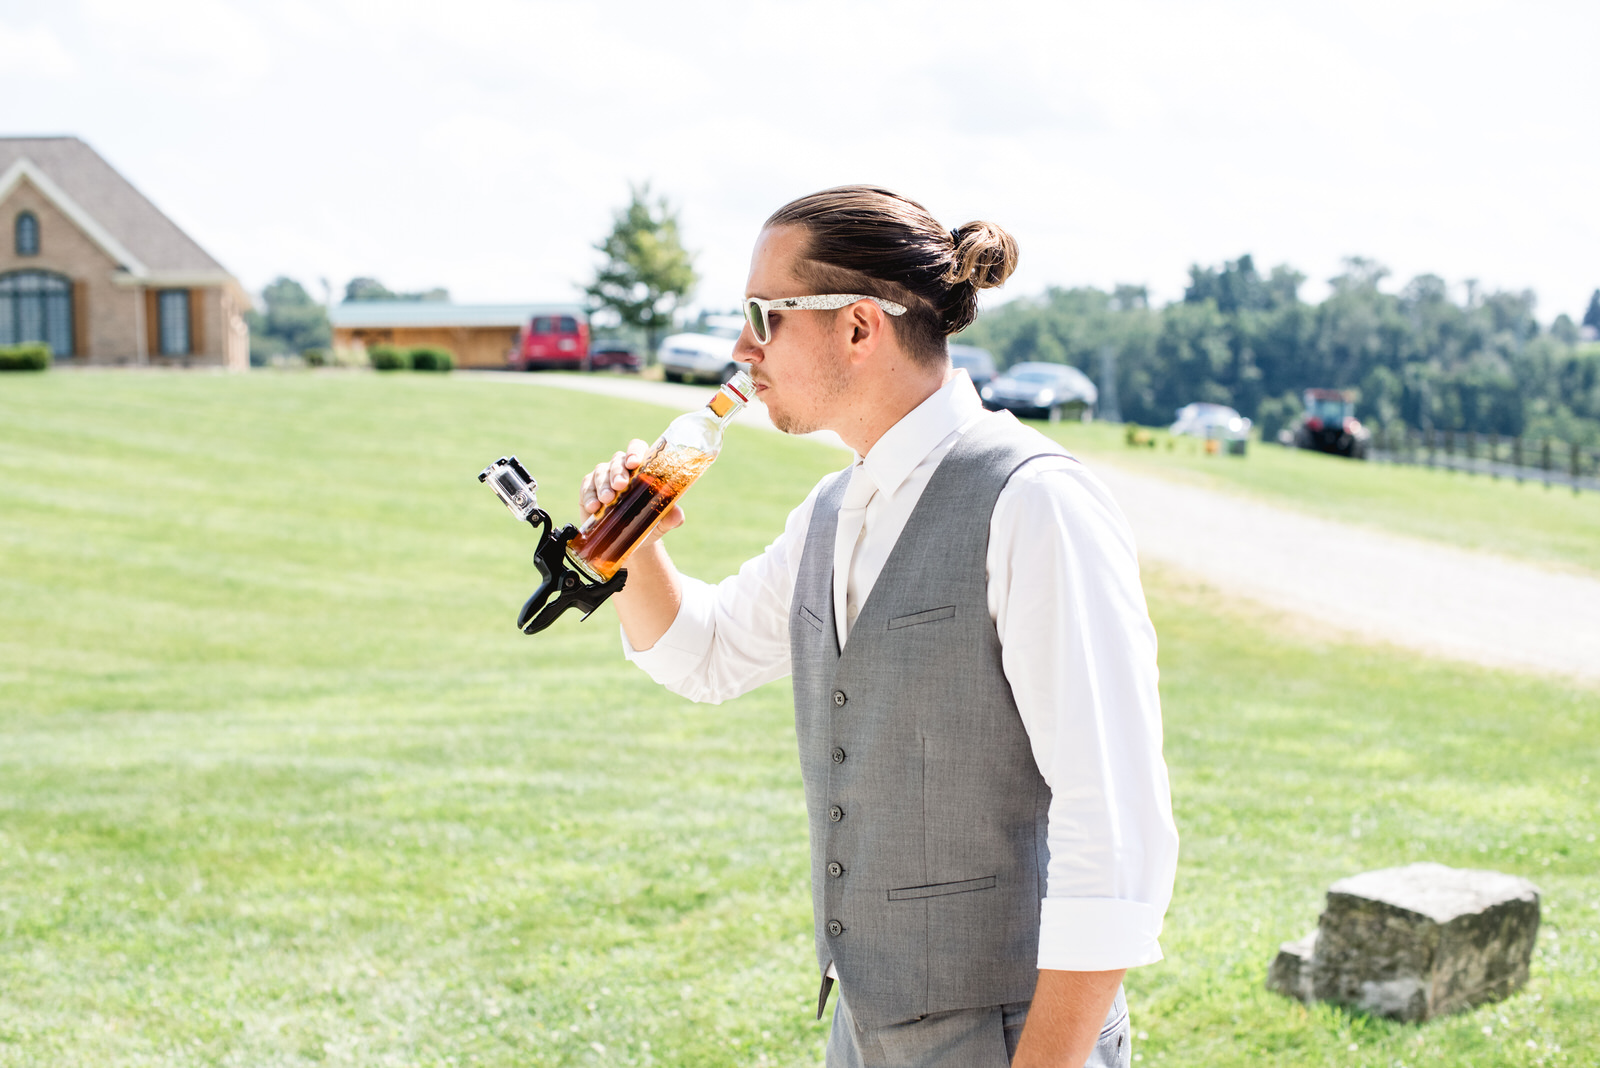 destiny-hill-farm-wedding-photos-pittsburgh-wedding-photographers-29.jpg